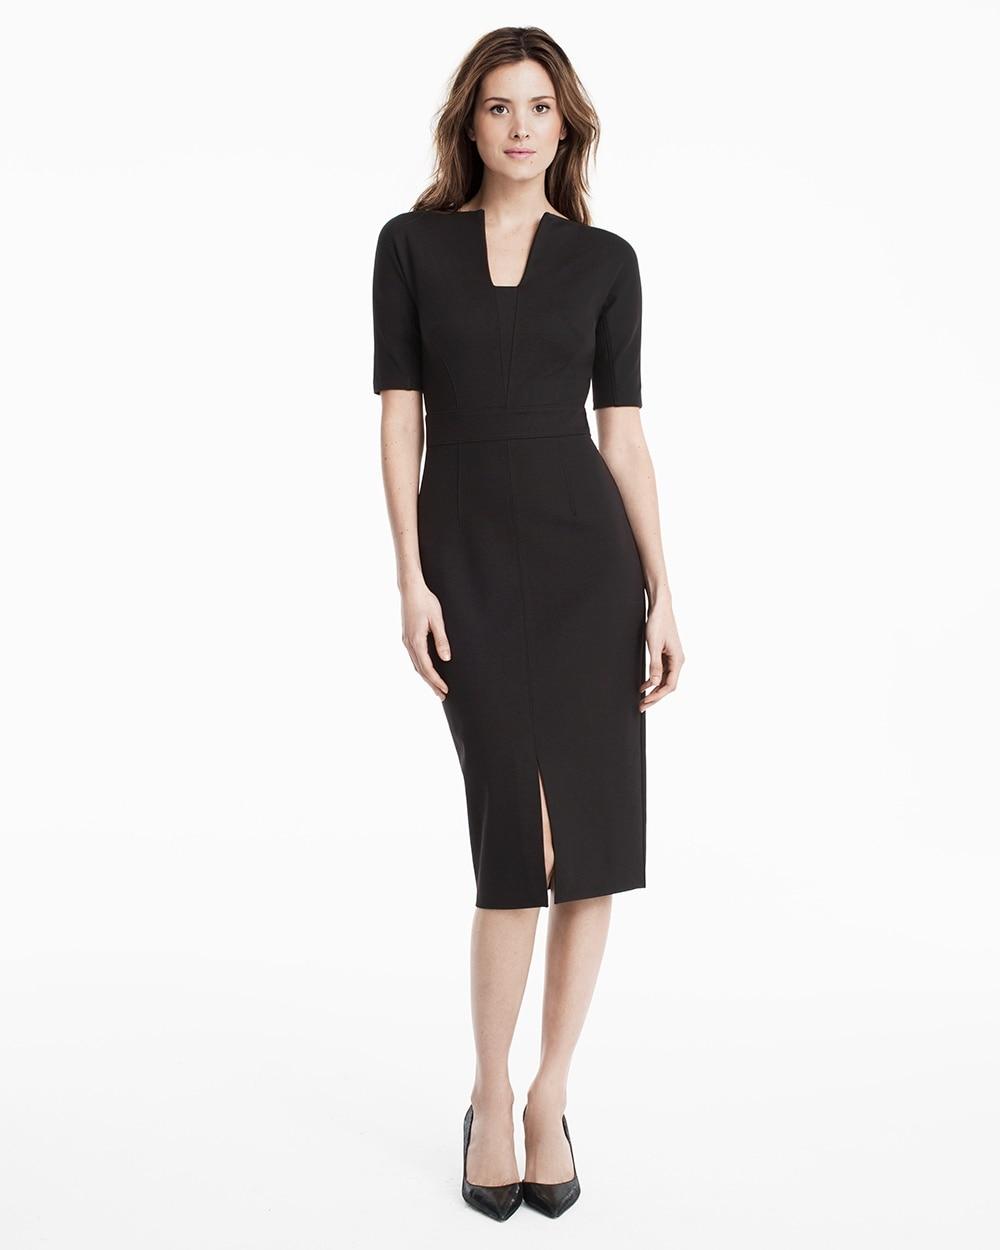 Elbow Sleeve Black Sheath Dress Whbm